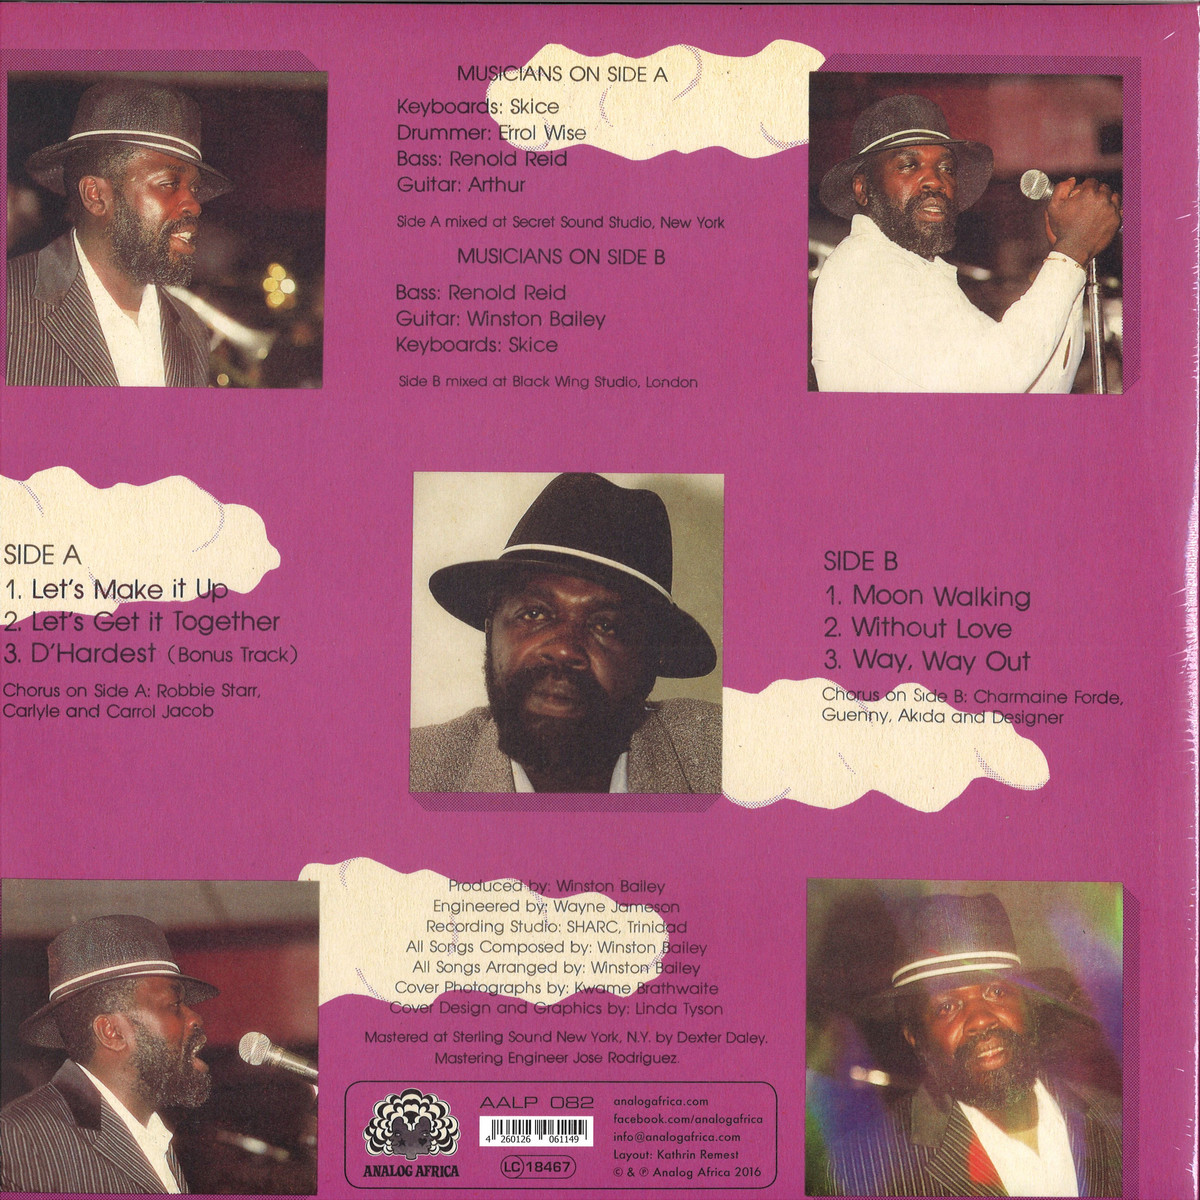 deejay de - Analog Africa